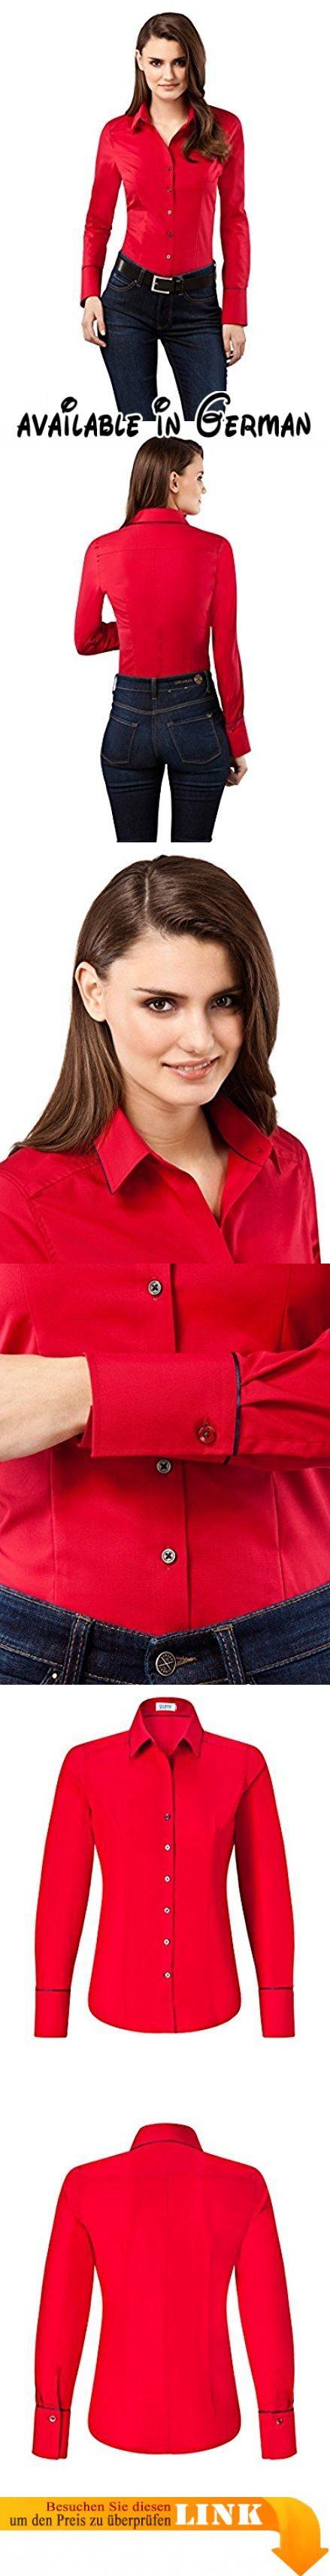 Vincenzo Boretti Damen Bluse Modern Fit Uni Bügelfrei Langarm,rot,34. modern-fit, formgebende Taillenabnäher, Knopfleiste, Kentkragen, lange Manschetten, Langarm, Ärmel mit Knopfleiste, unterstes Knopfloch horizontal geschnitten, Ersatzknöpfe, bügelfrei, bügelfrei - nach dem Waschen tropfnass aufhängen, Hemd glatt ziehen, trocknen lassen, knitterarm, atmungsaktiv. unifarben, 100% Baumwolle, 40° Maschinenwäsche, mäßig heiß bügeln #Apparel #SHIRT